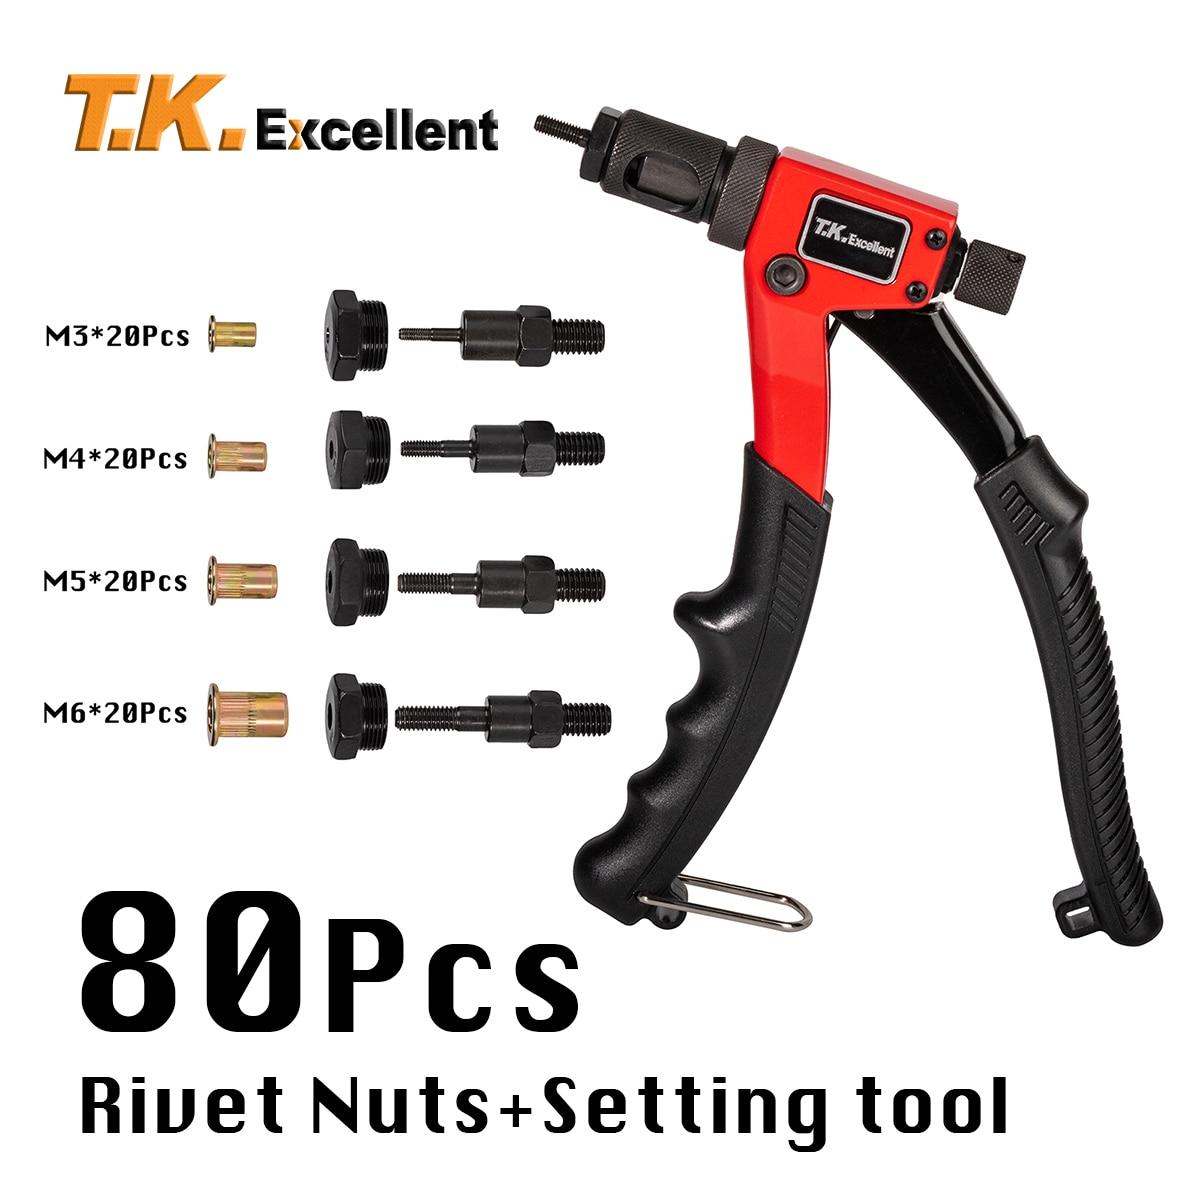 BT-603 Rivet Nut Setting Tool Kit M3 M4 M5 M6 4-Piece mandrels Hand Riveter Nut Gun, Riveting Tools with Nut Setting System